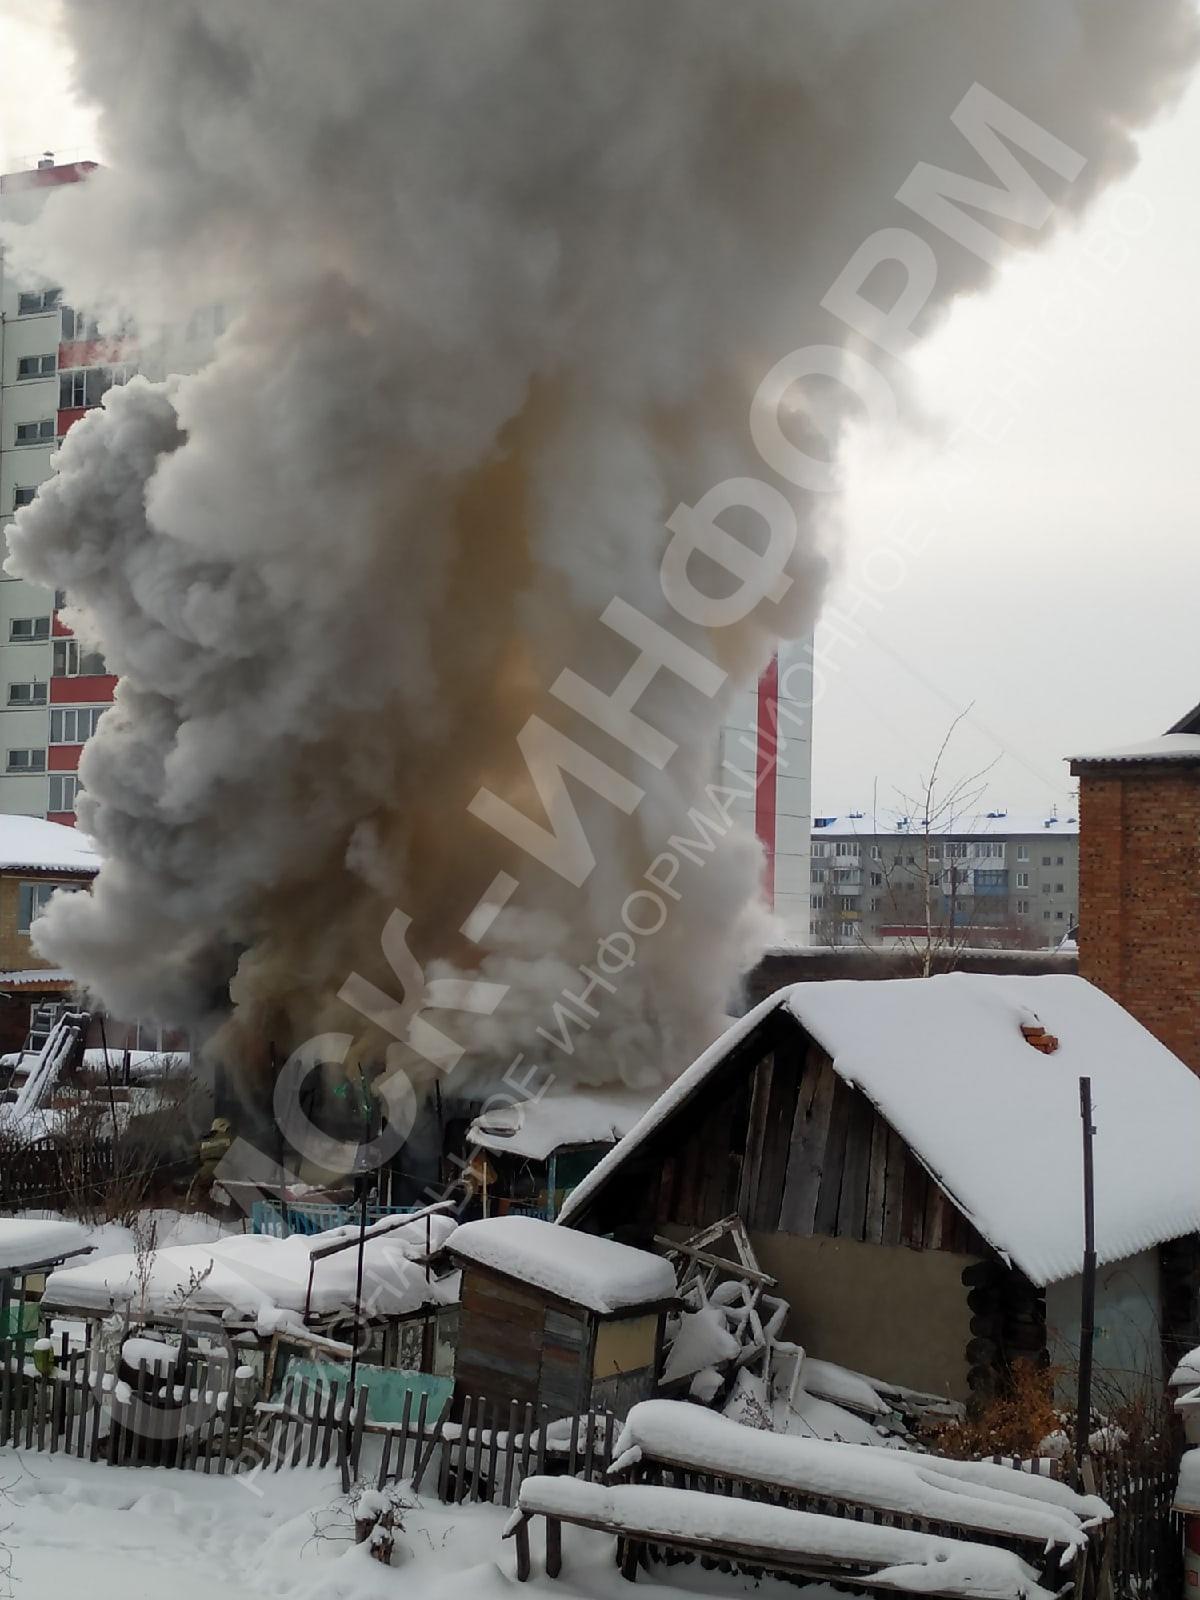 На пожаре в Омске заживо сгорел пенсионер #Новости #Общество #Омск